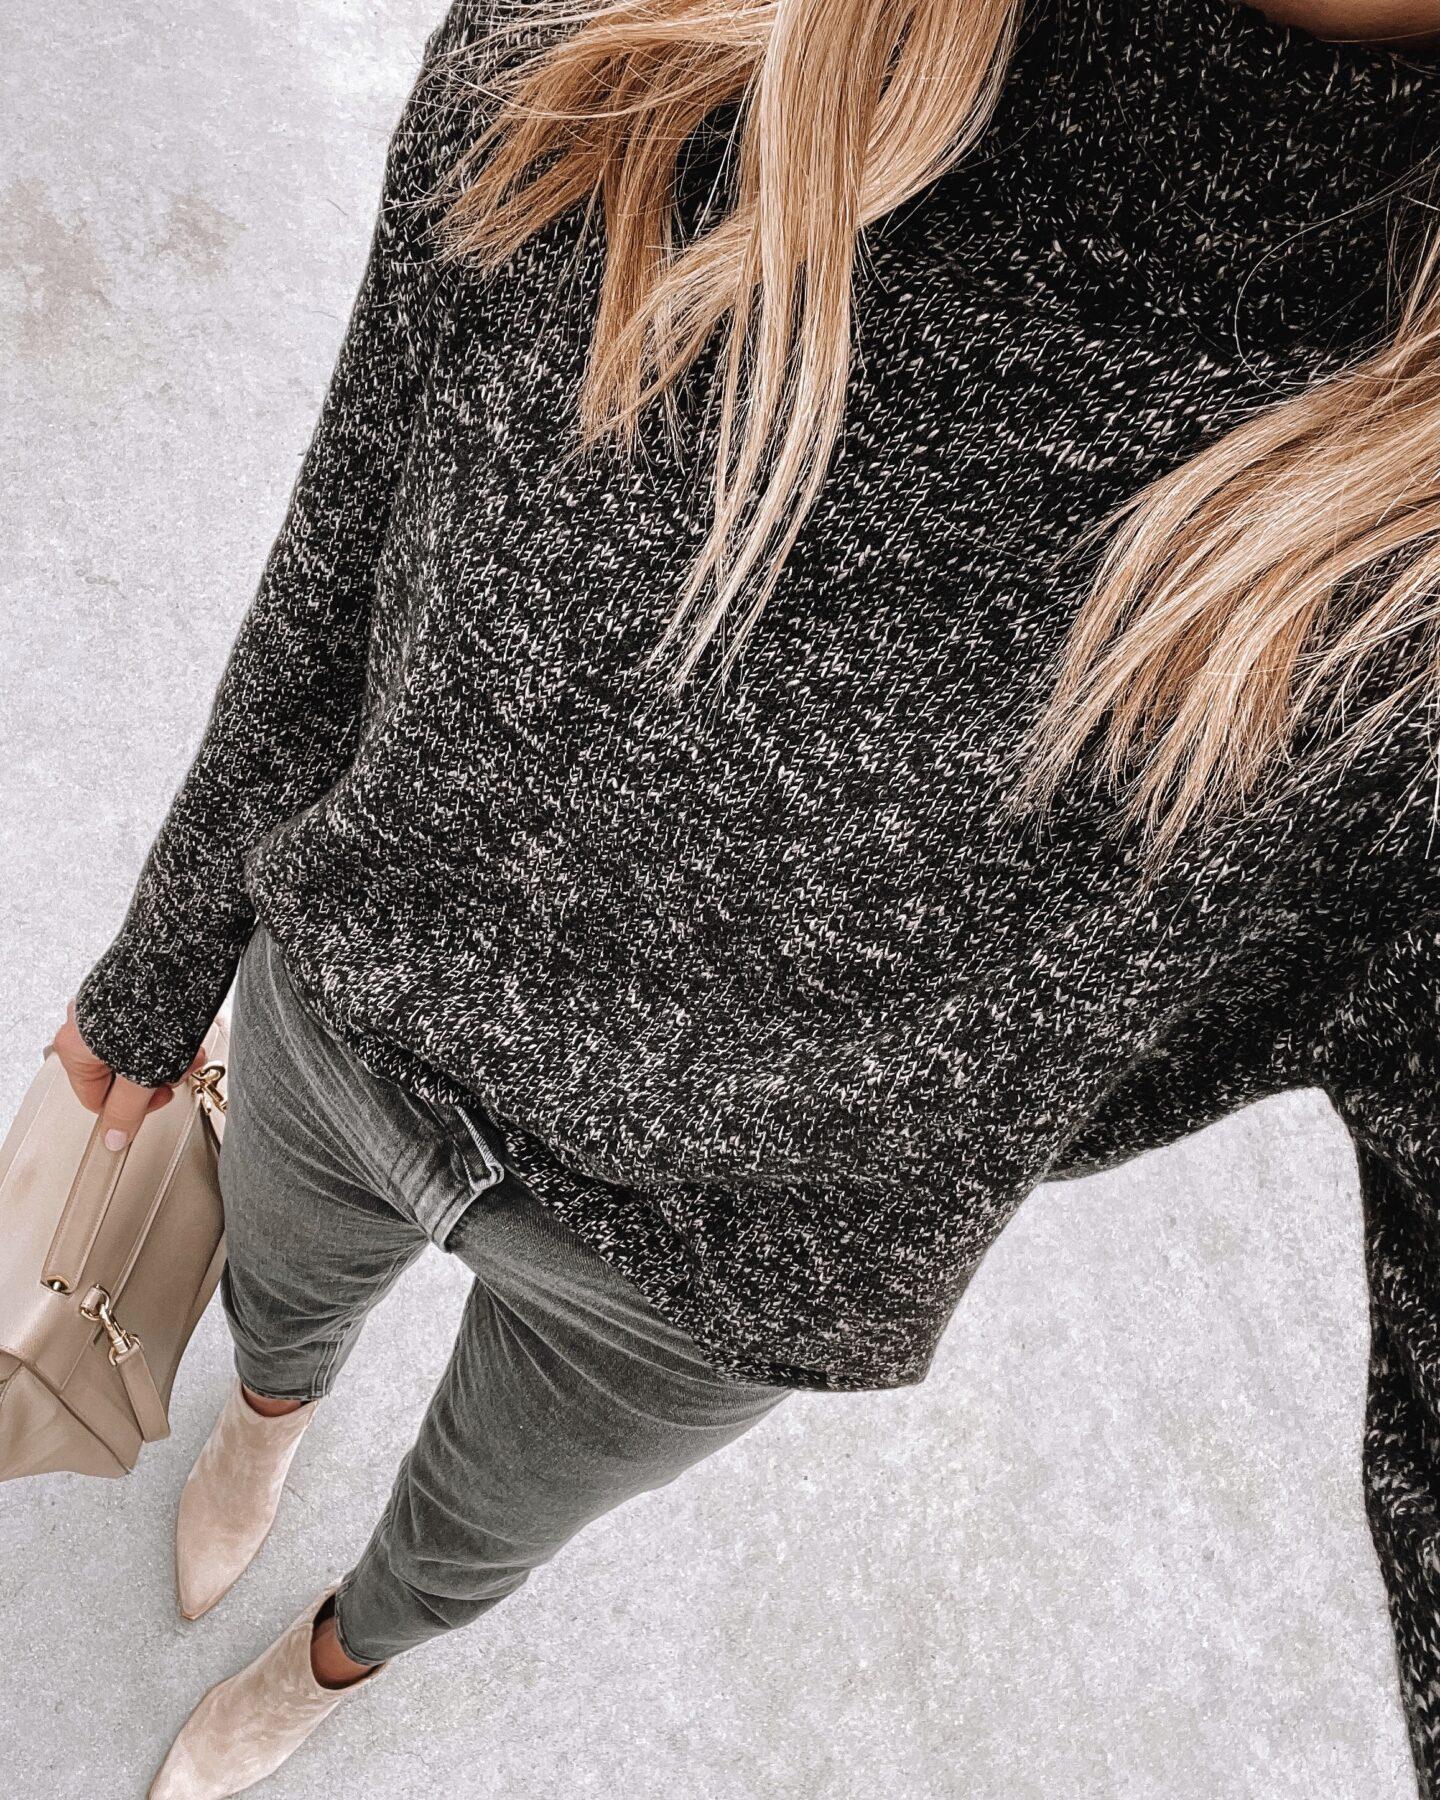 Fashion Jackson Wearing Jenni Kayne Recycled Cashmere Marled Turtleneck Black Jeans Tan Suede Booties